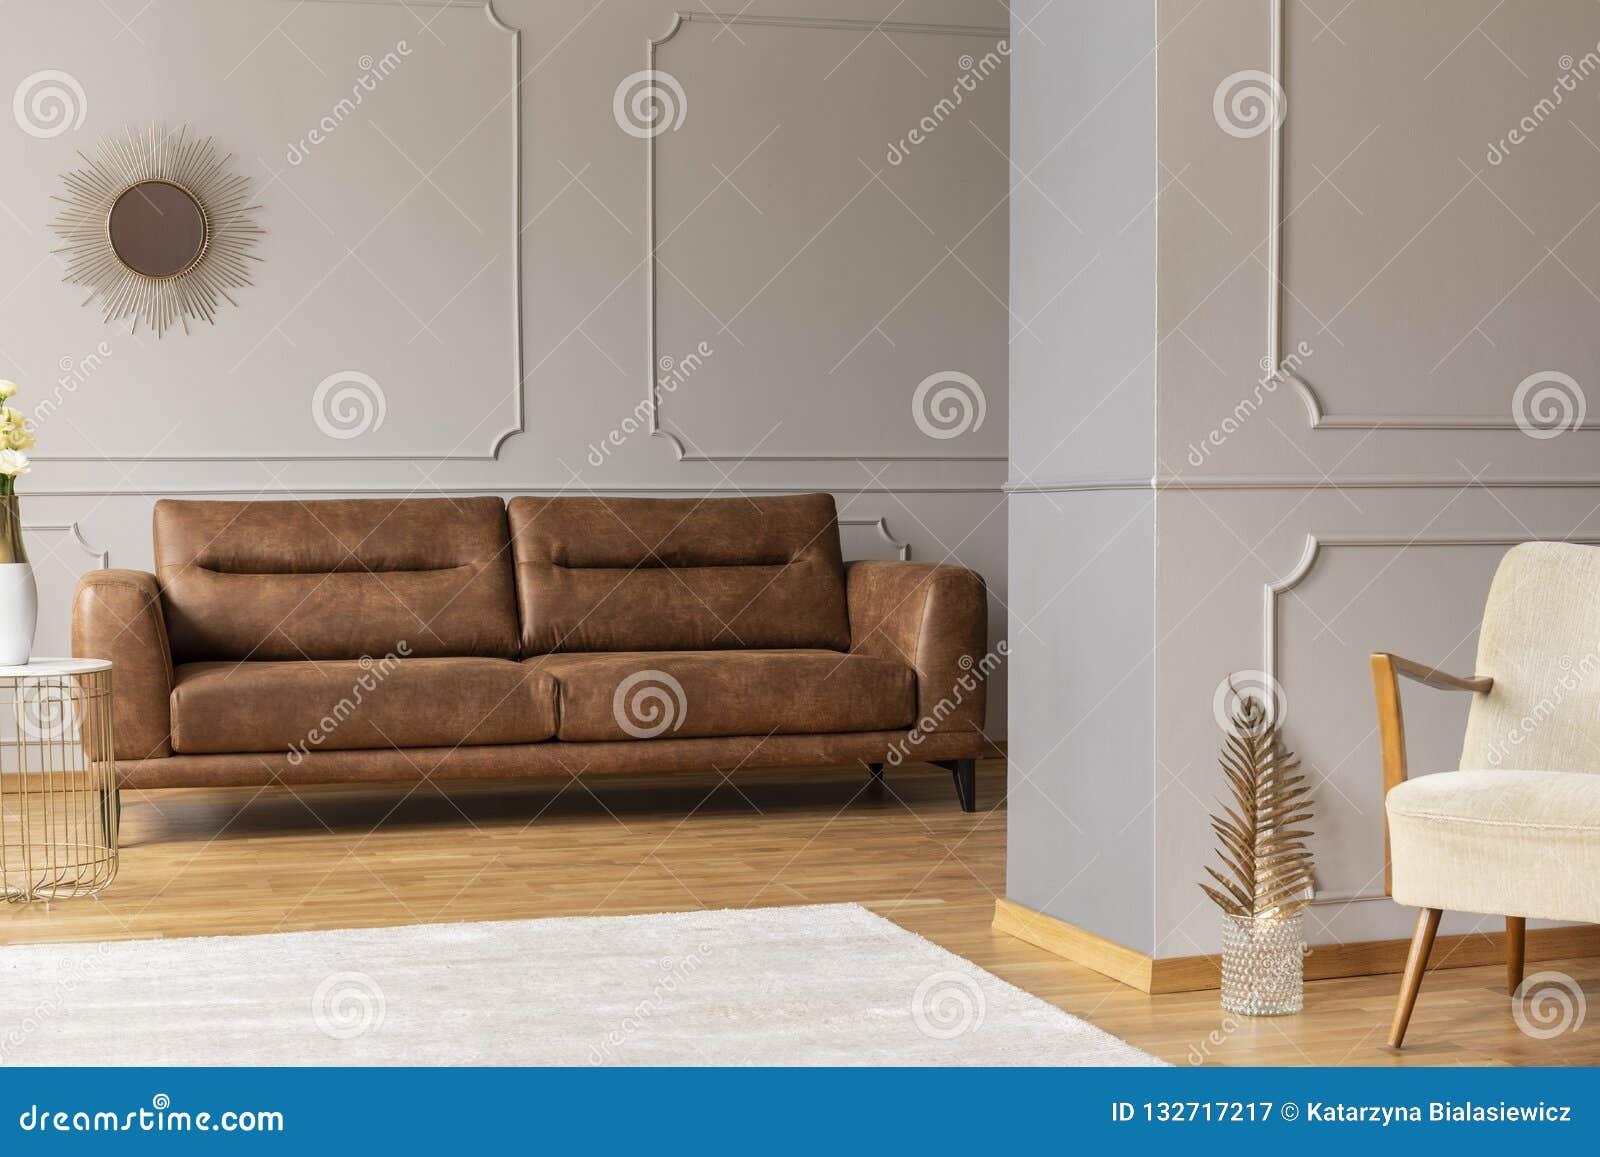 Strange Open Space Flat Interior With Leather Brown Couch Molding Inzonedesignstudio Interior Chair Design Inzonedesignstudiocom